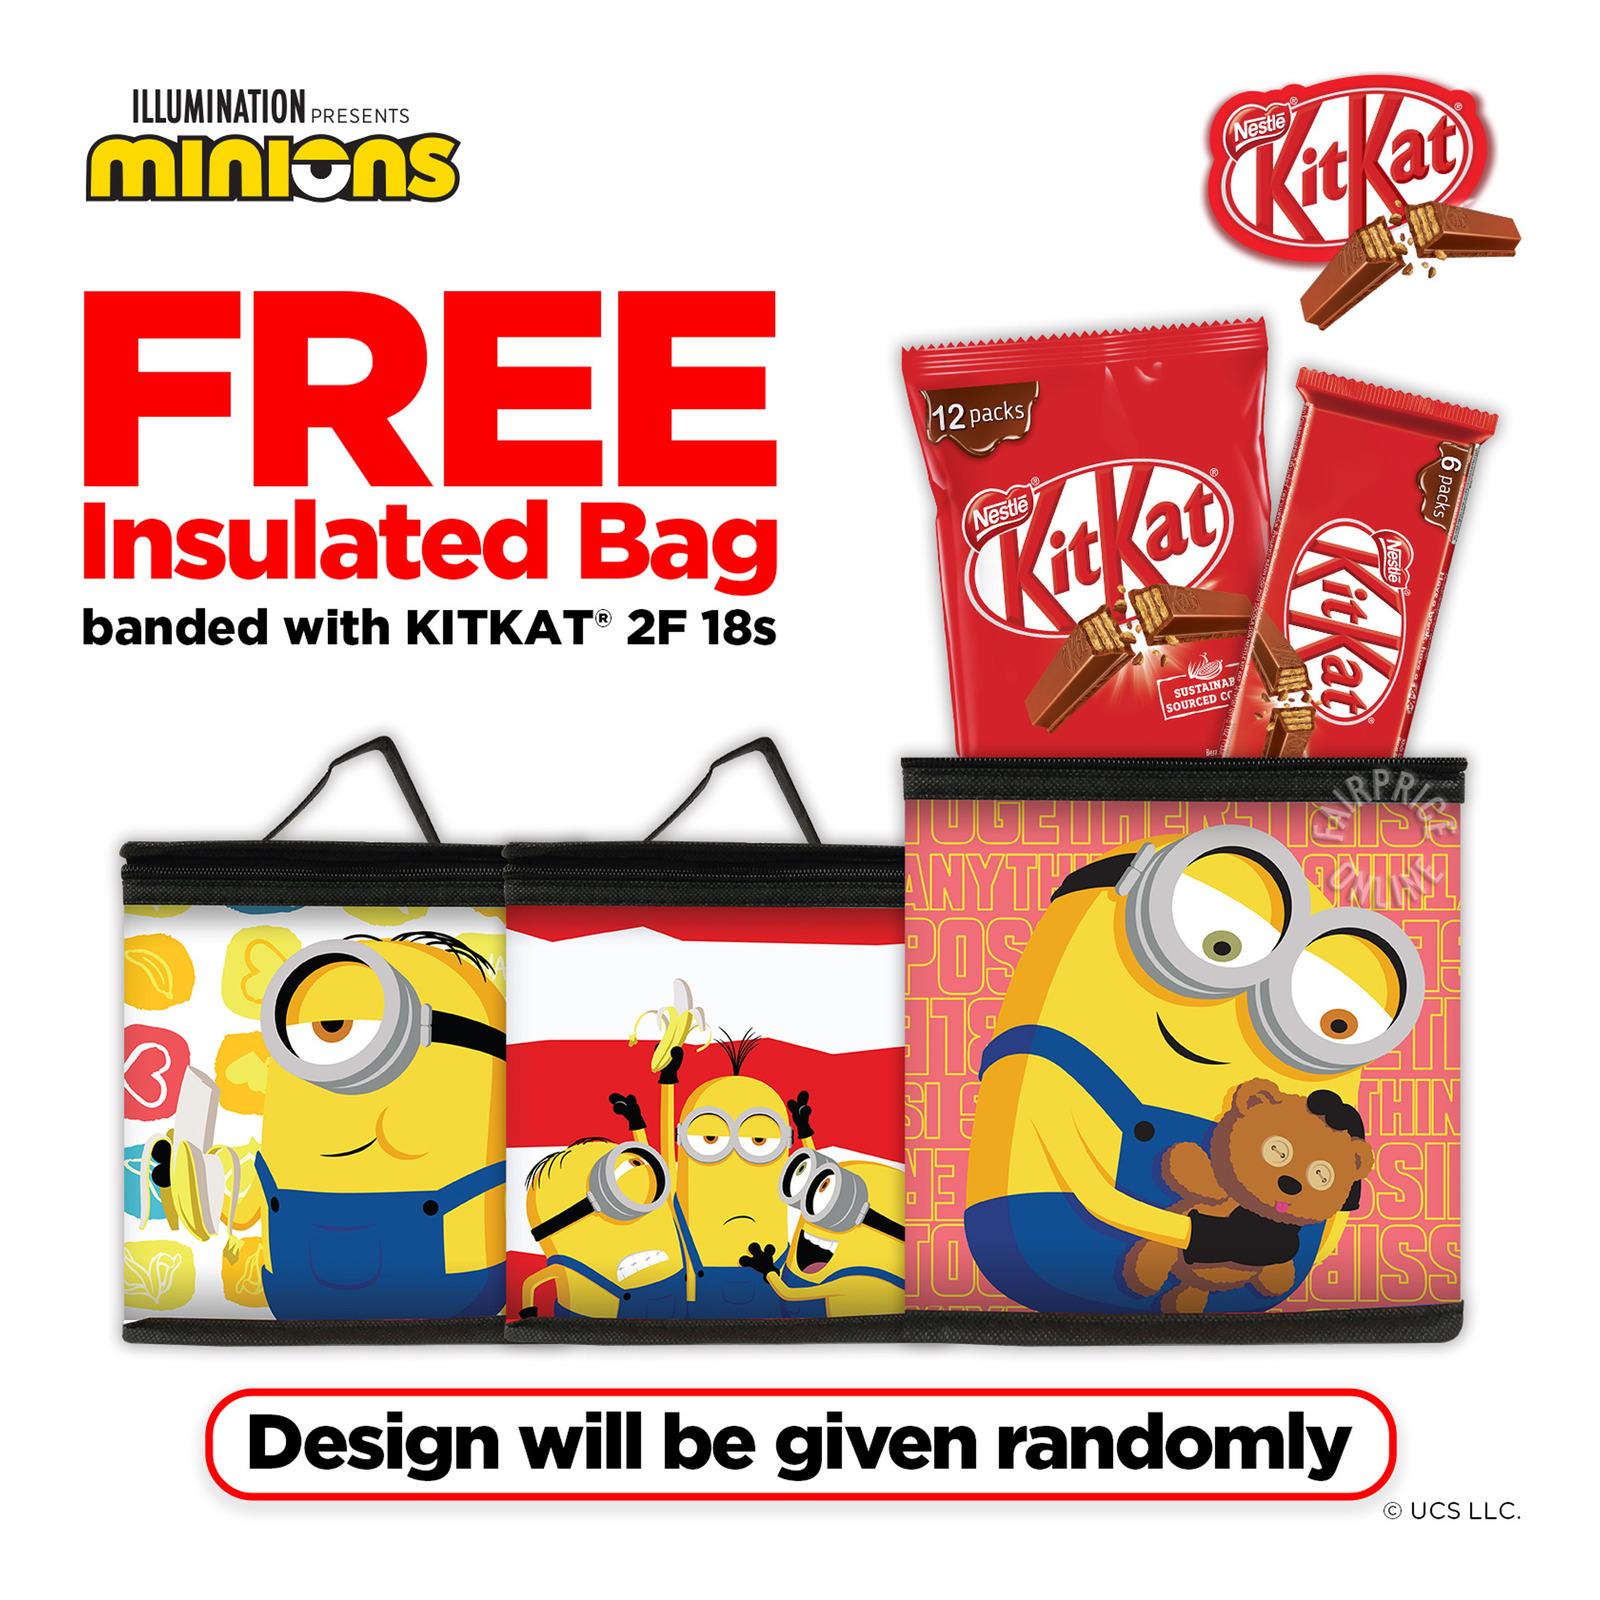 Nestle Kit Kat 2 Finger Chocolate Bar - Milk + Free Bag